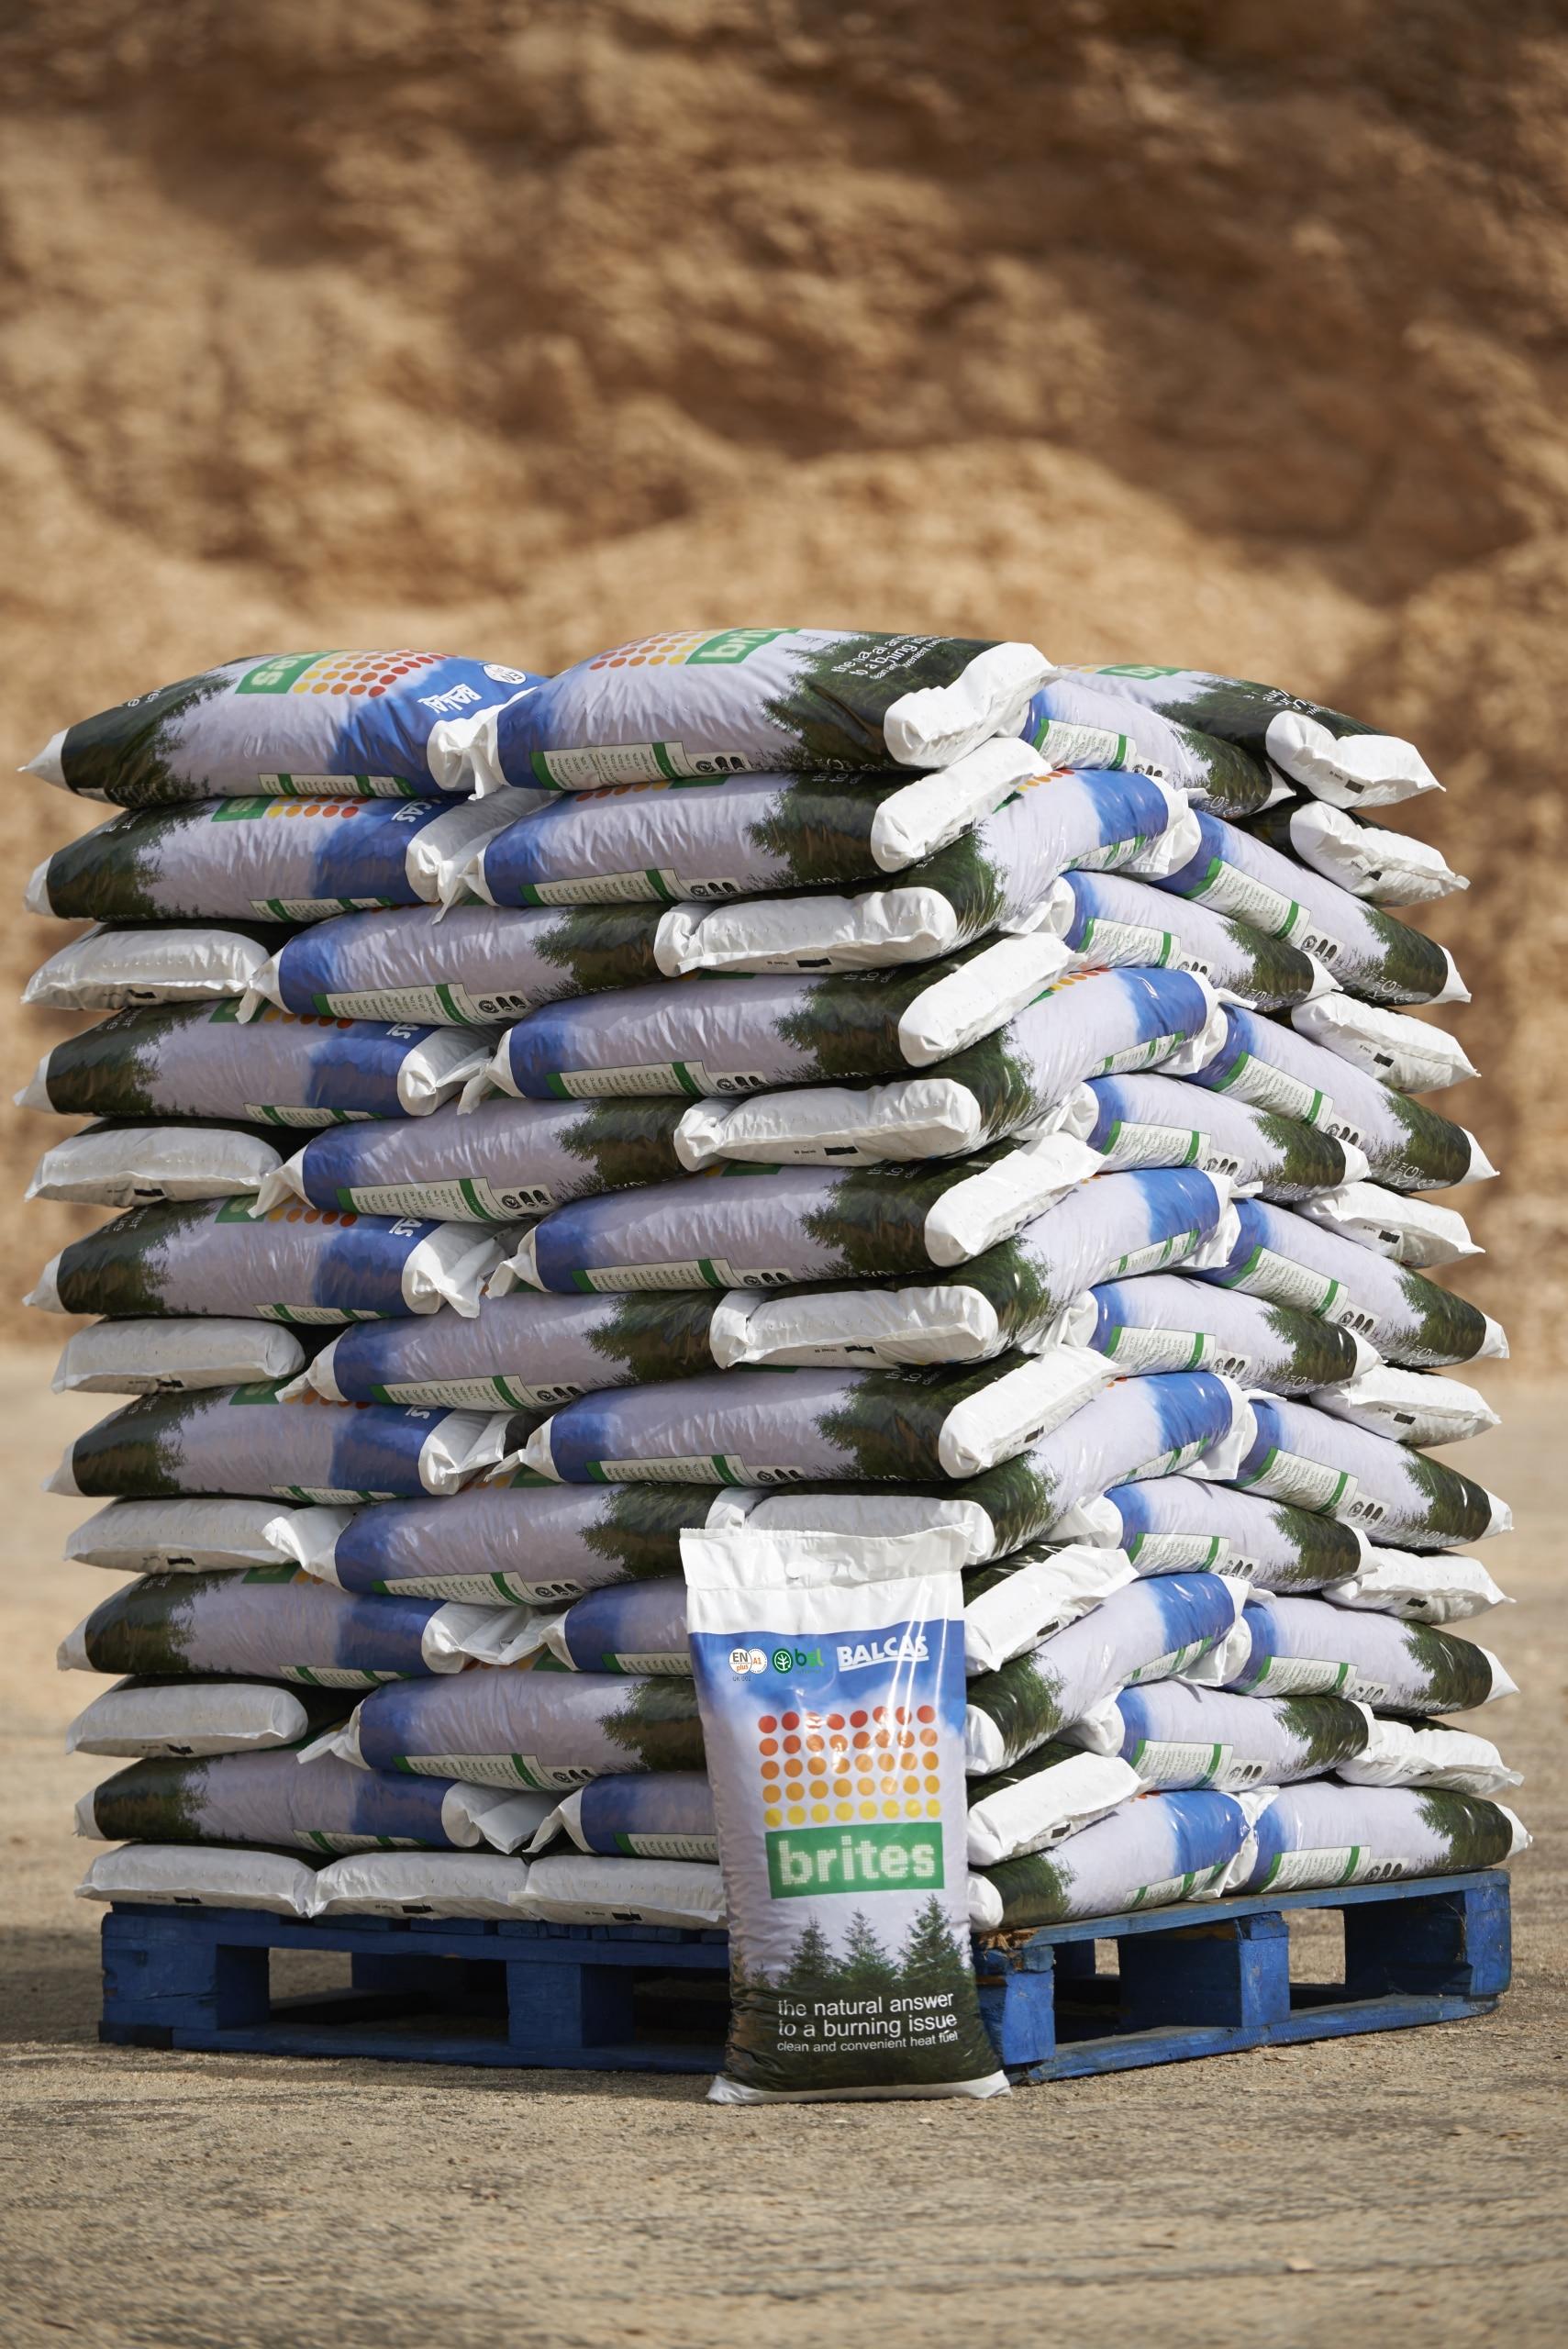 bagged wood pellets